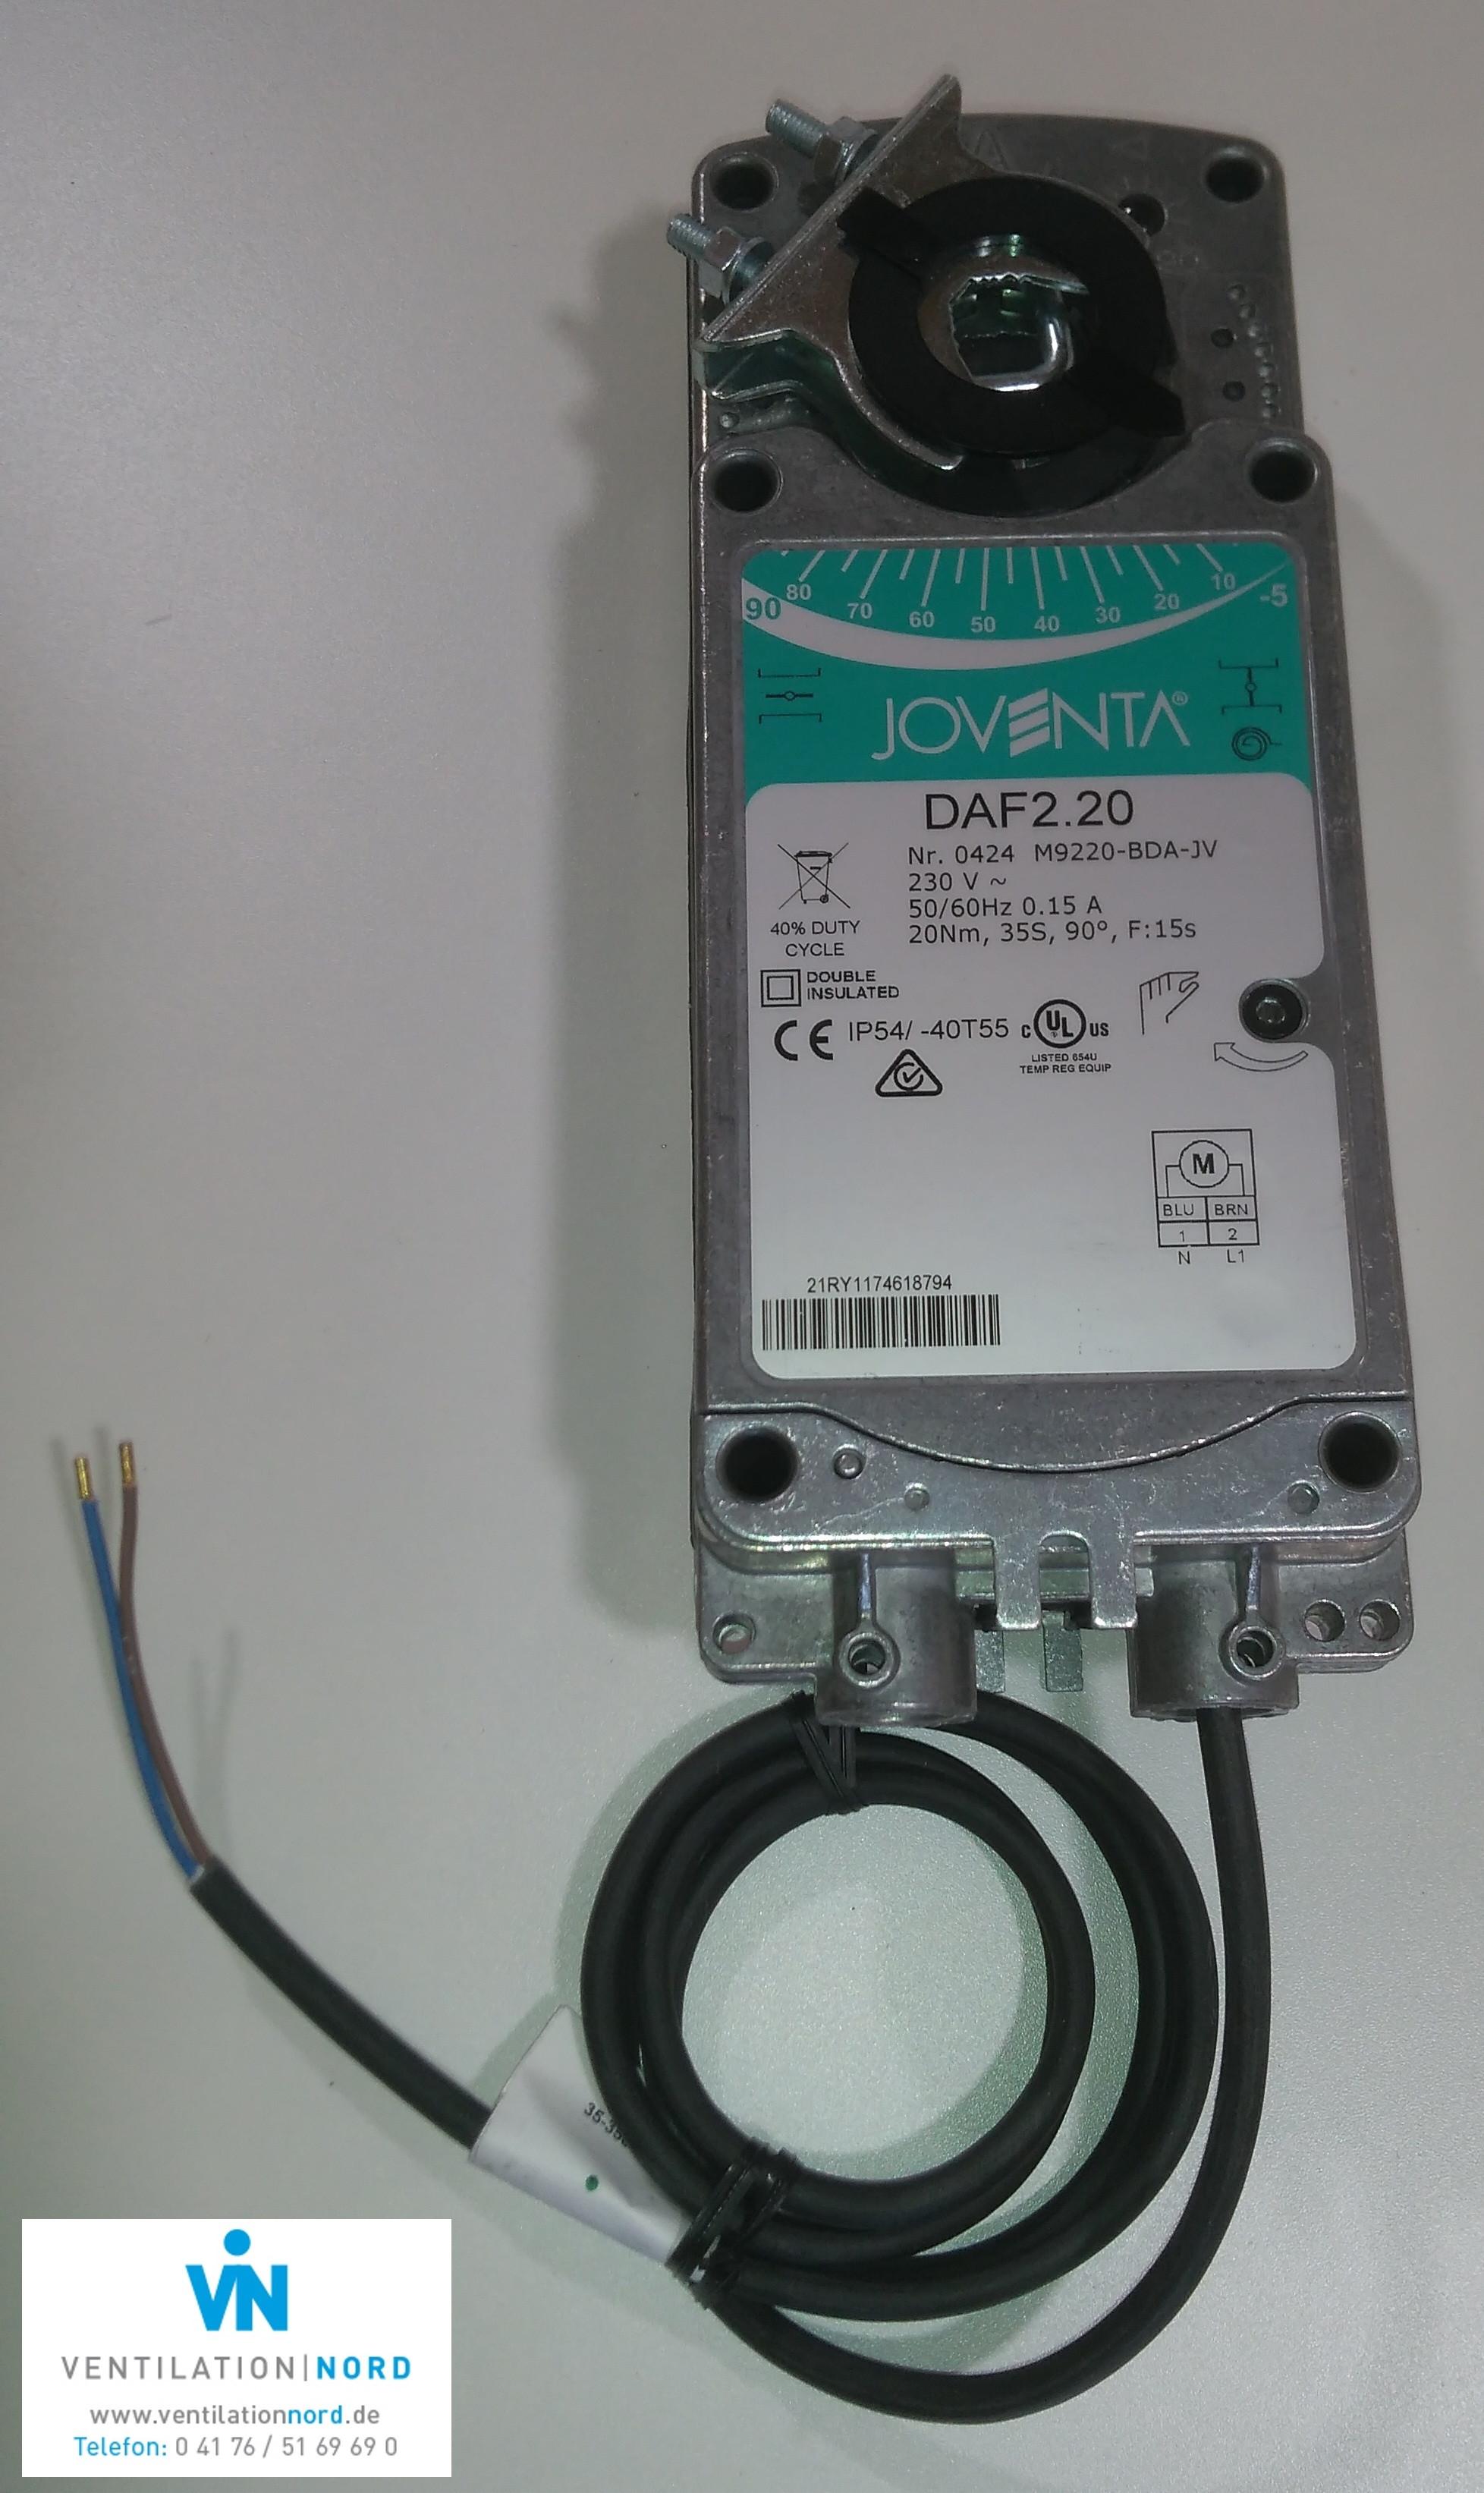 Joventa Klappenstellantrieb DAF2.20S Federrücklauf